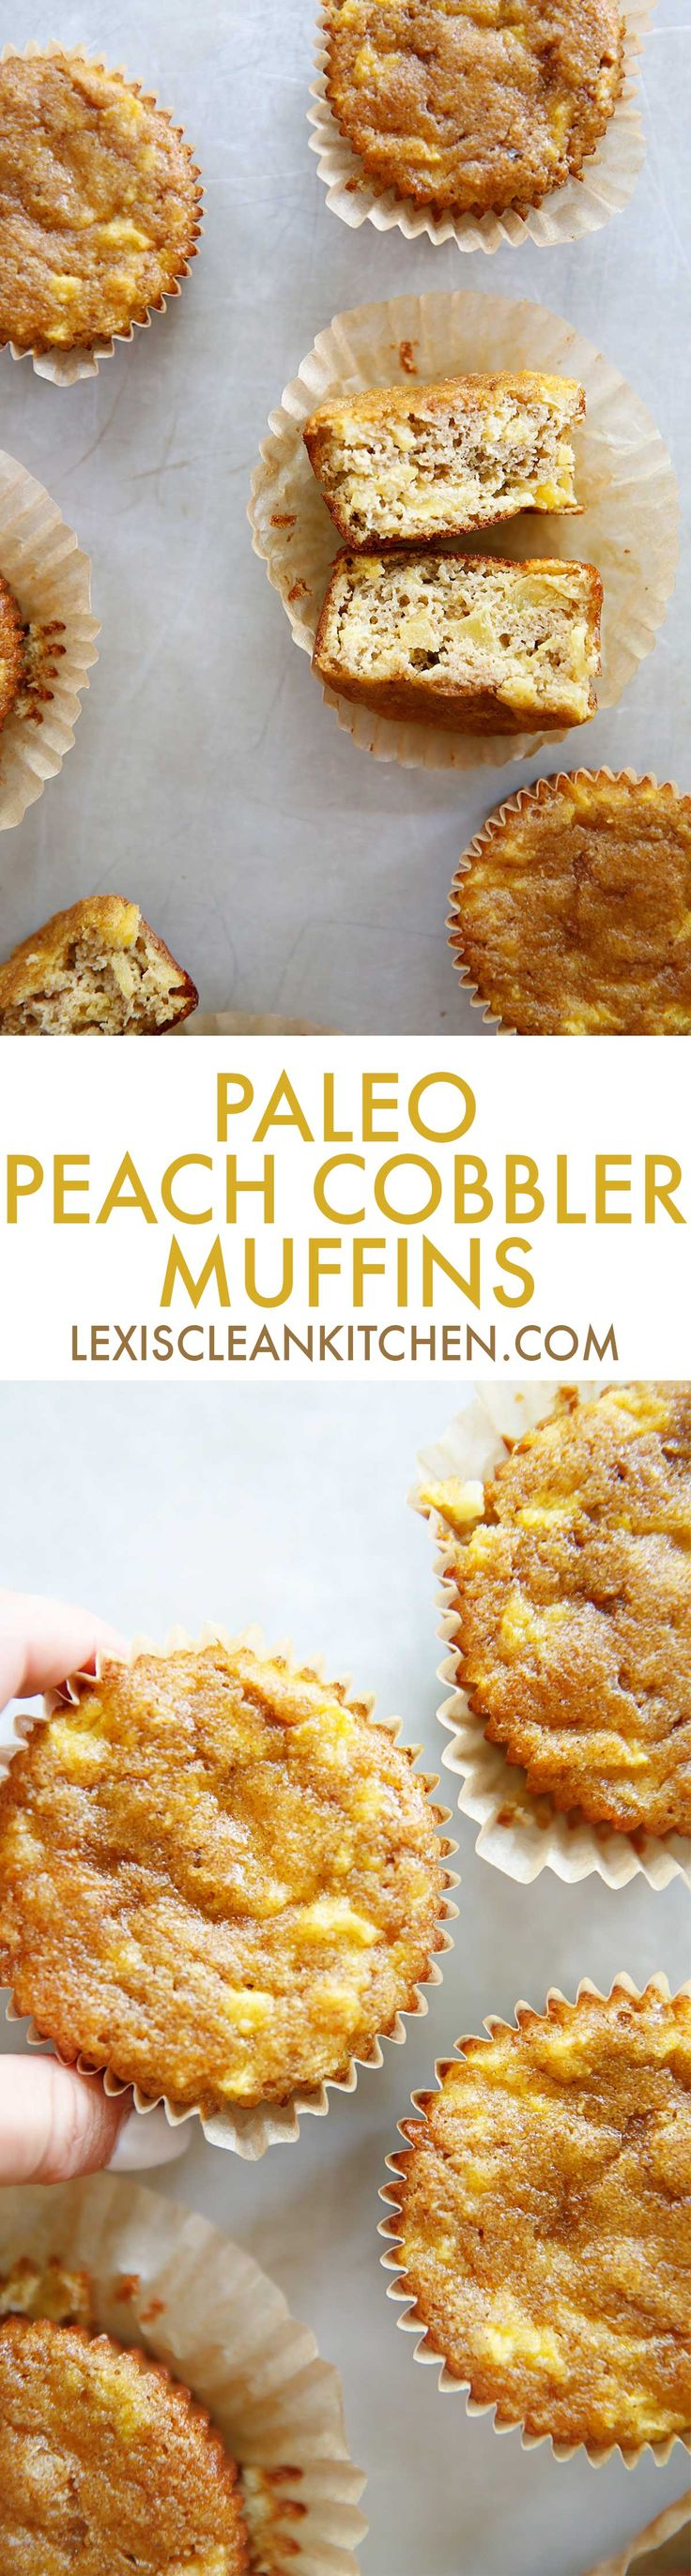 Peach Cobbler Muffins   Lexi's Clean Kitchen